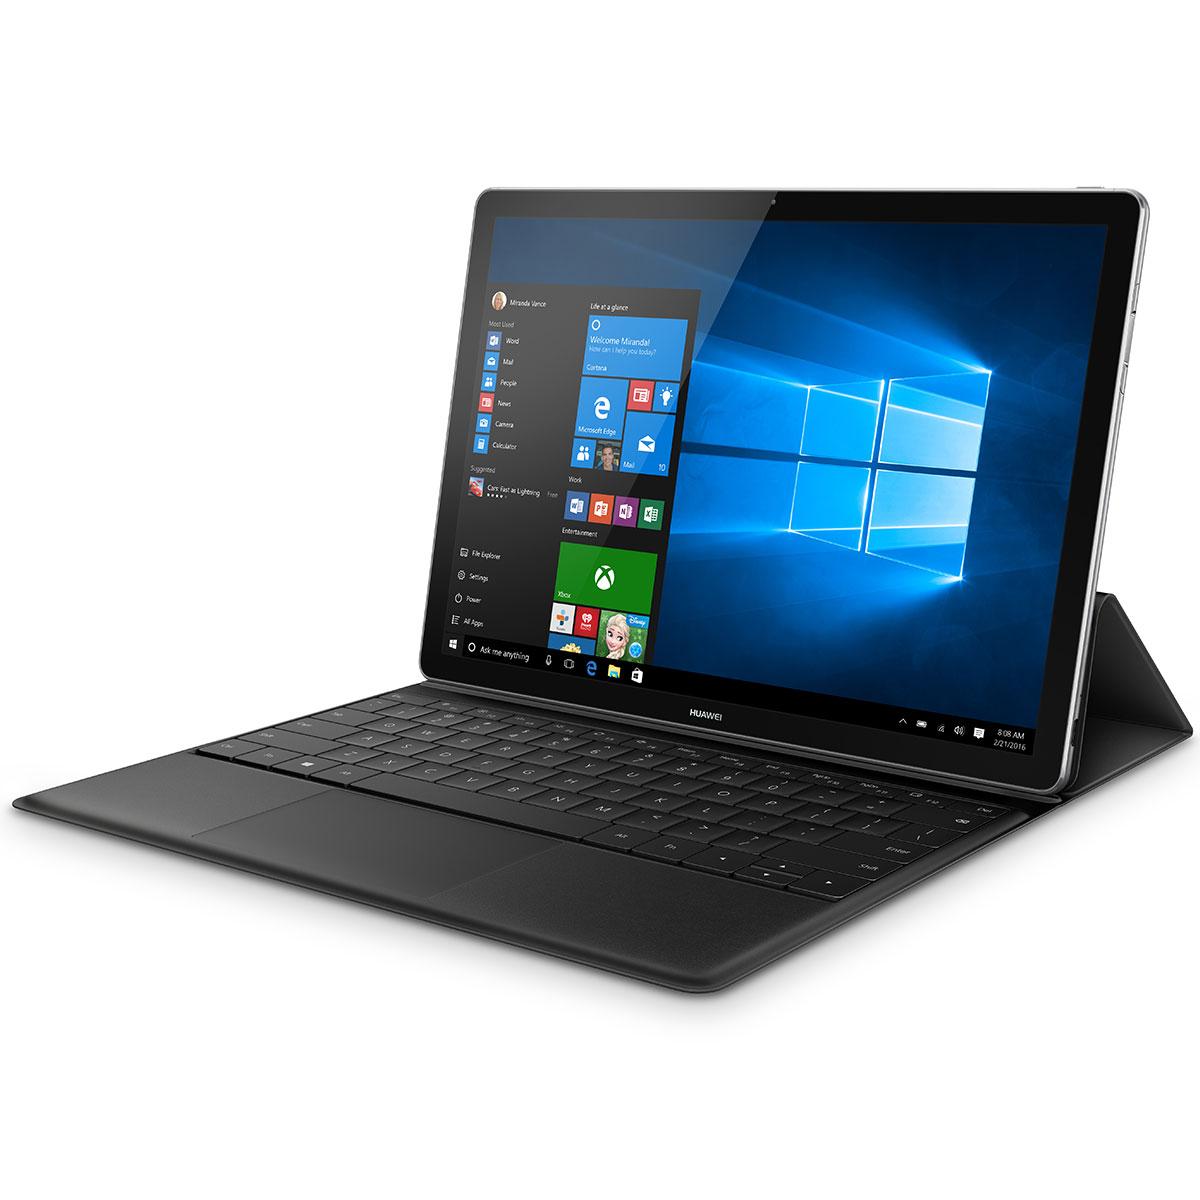 Ноутбук Lenovo IdeaPad 320-15AST (80XV00J2RK) 15.6'' HD/AMD A9-9420 (3.00GHz)/8GB/1TB/R520M 2GB/DVD нет/WiFi/BT/Win 10/Black